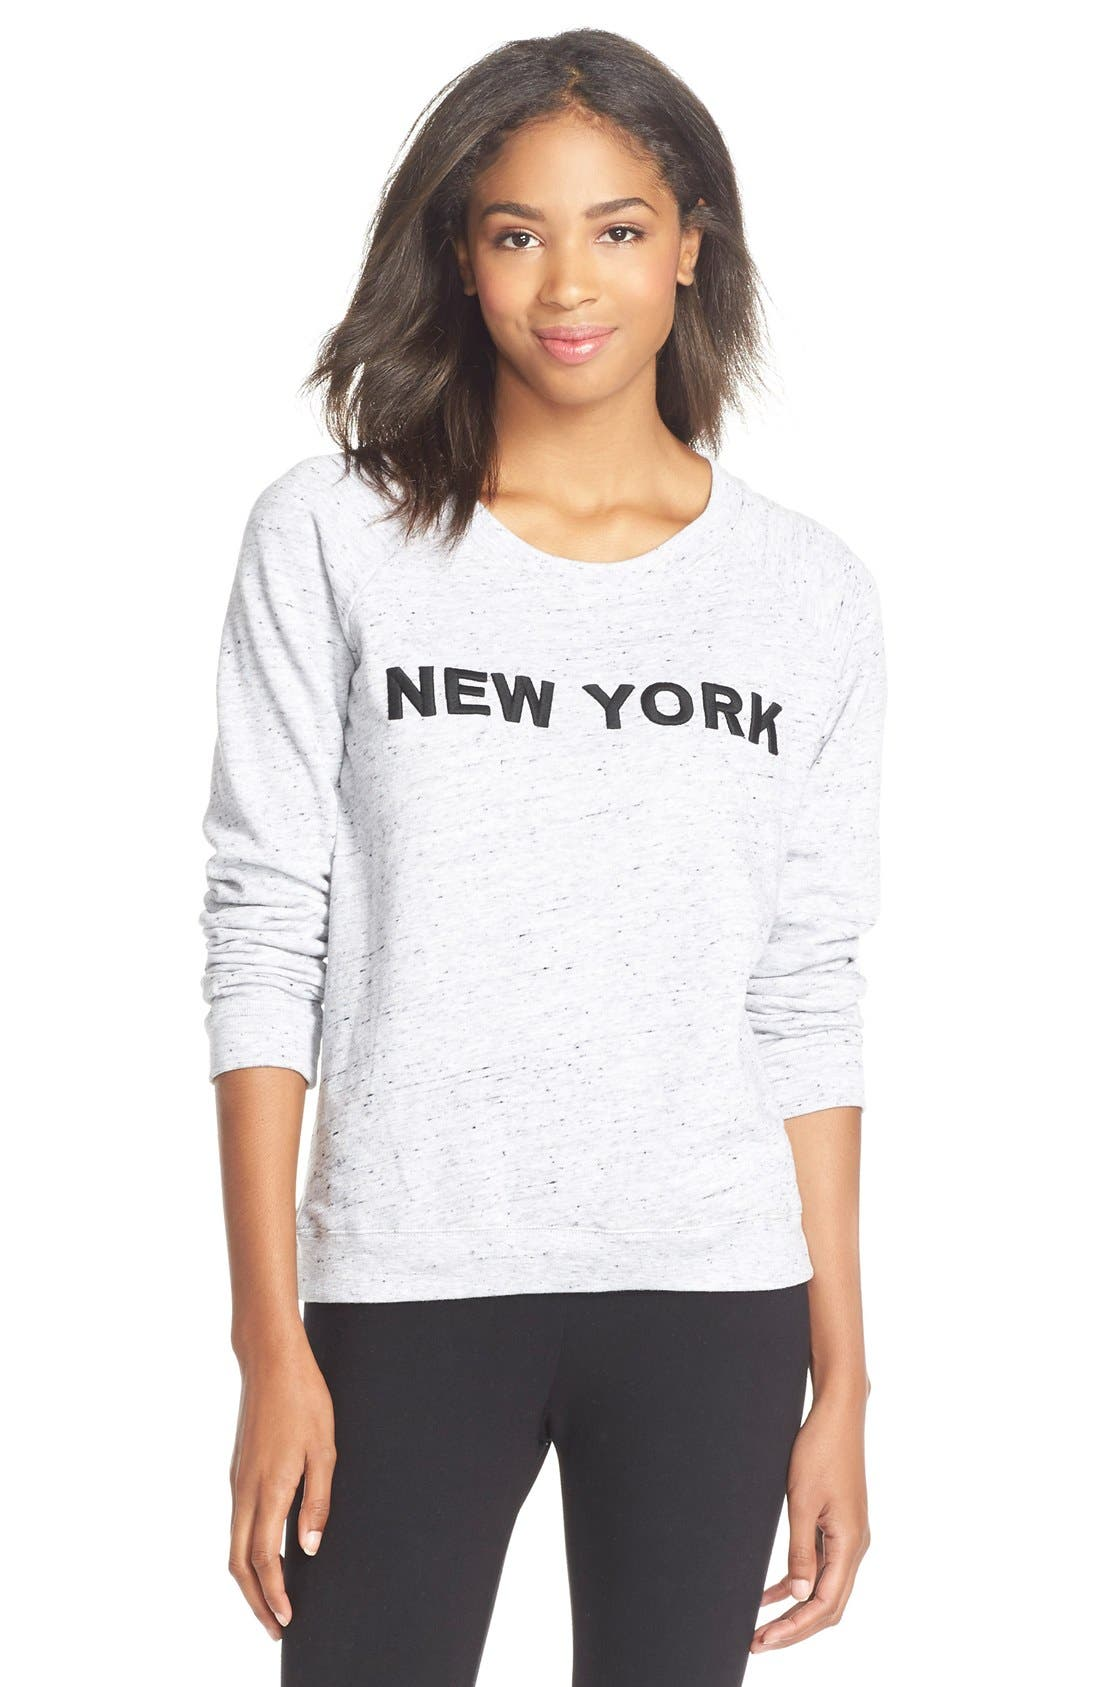 Main Image - Monrow'City' Embroidered Pullover Sweatshirt